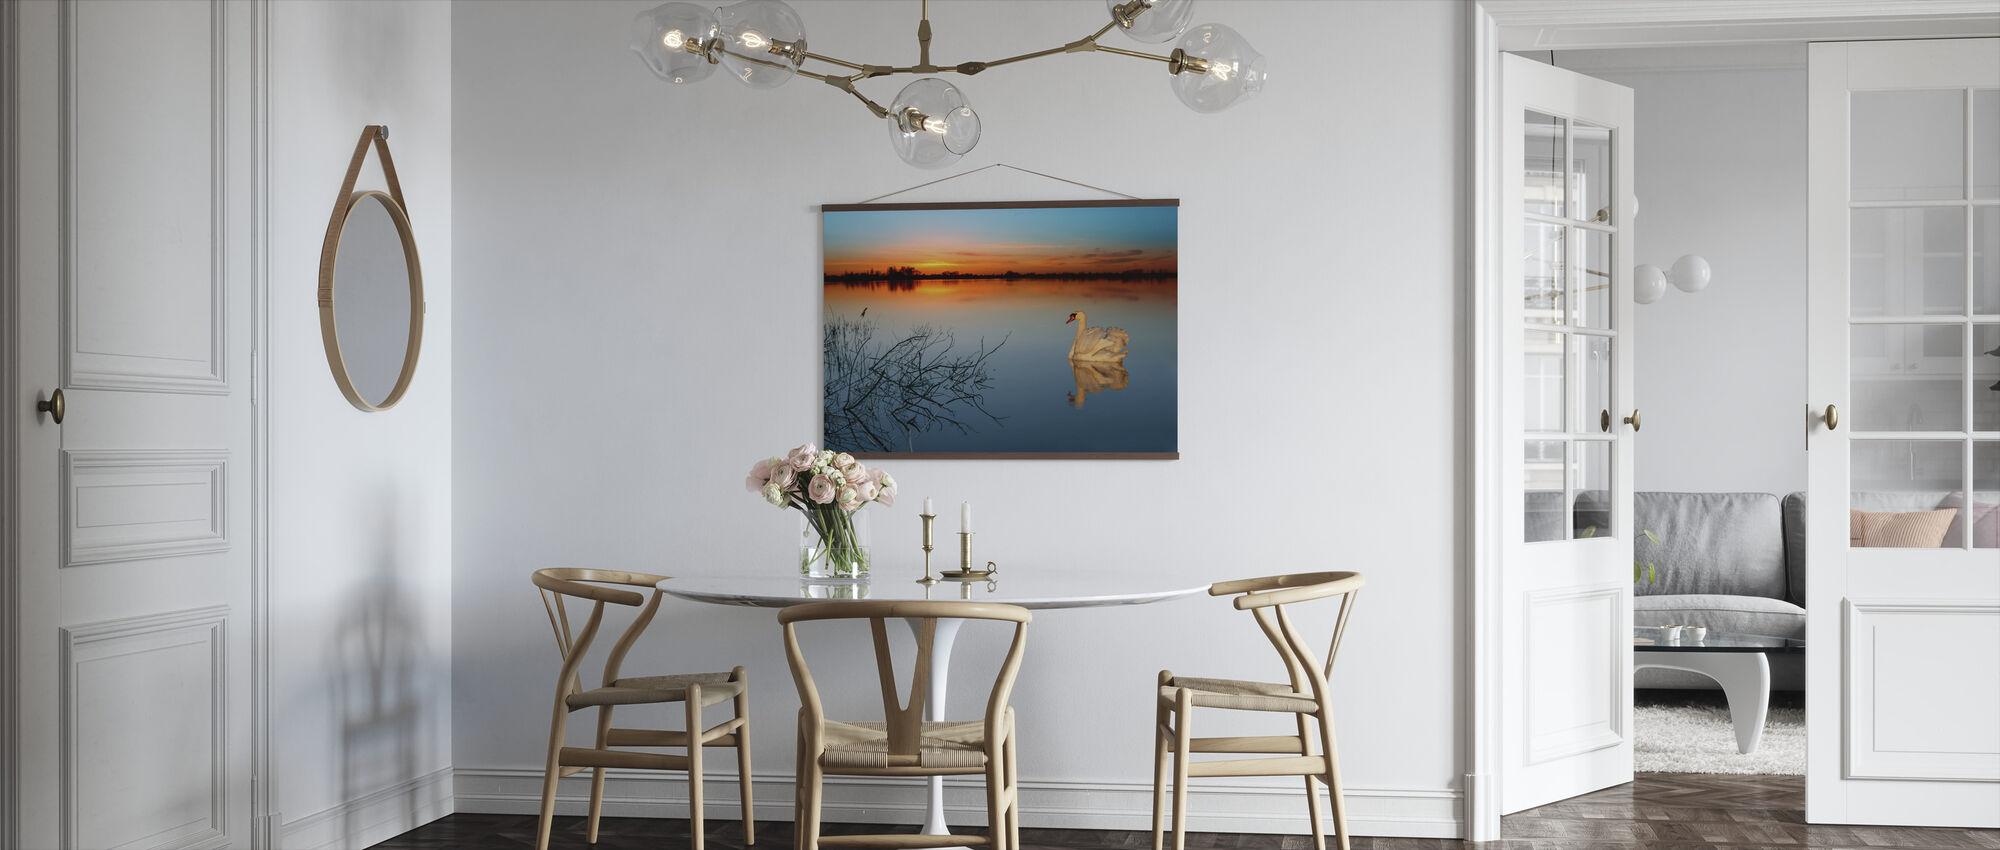 Swan på en sjö - Poster - Kök